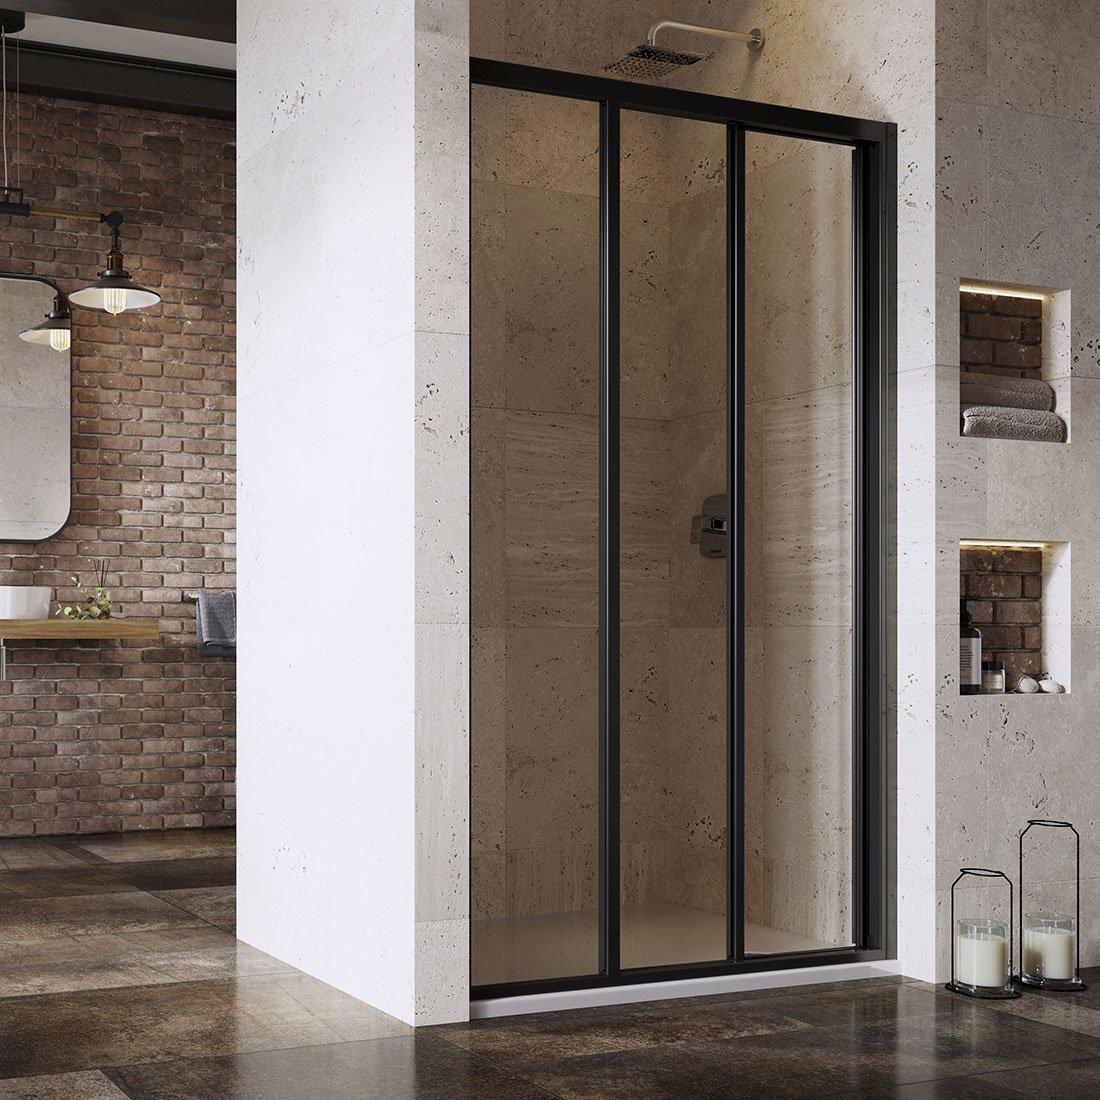 ASDP3-100 198 (Transparent) Black Душевая дверь